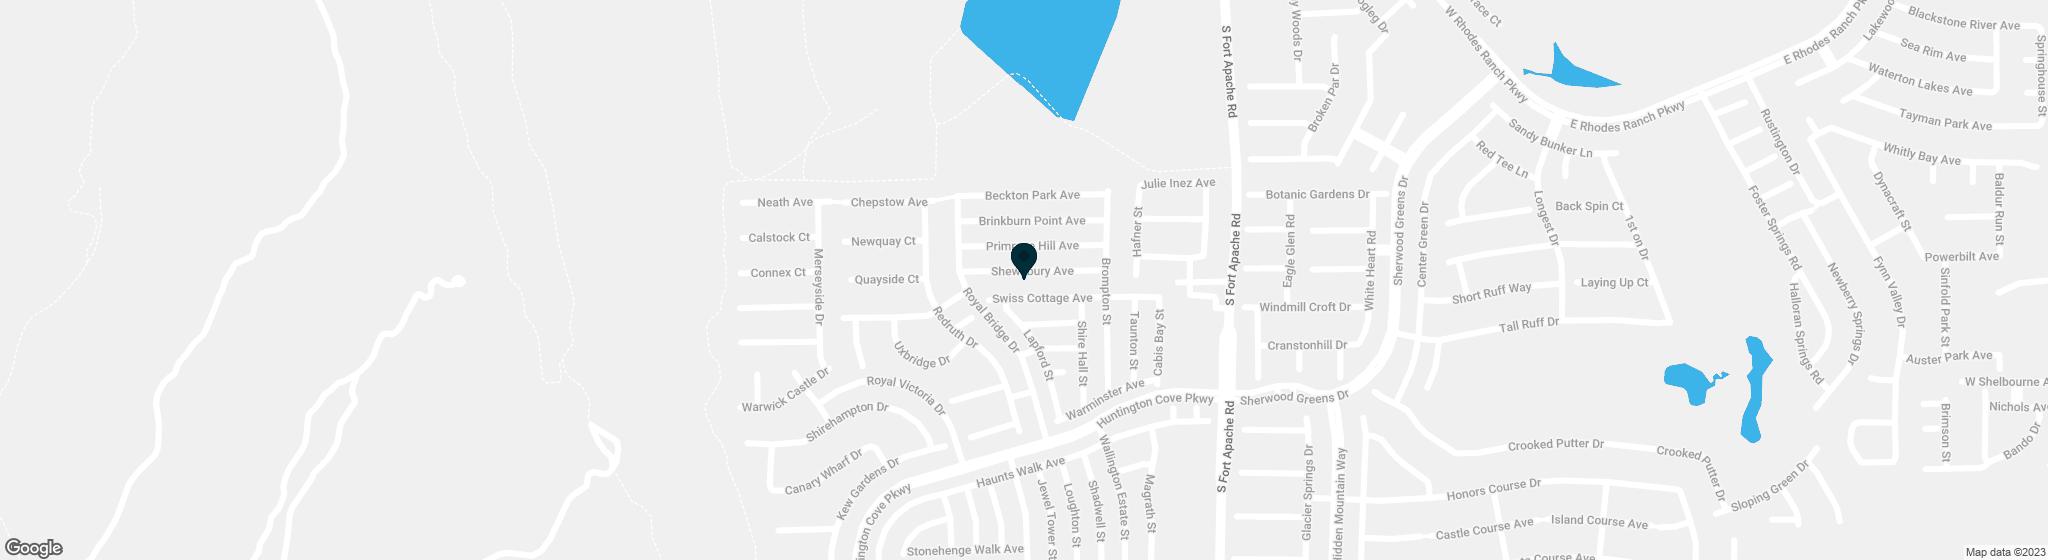 573  Shewsbury Avenue Las Vegas NV 89178